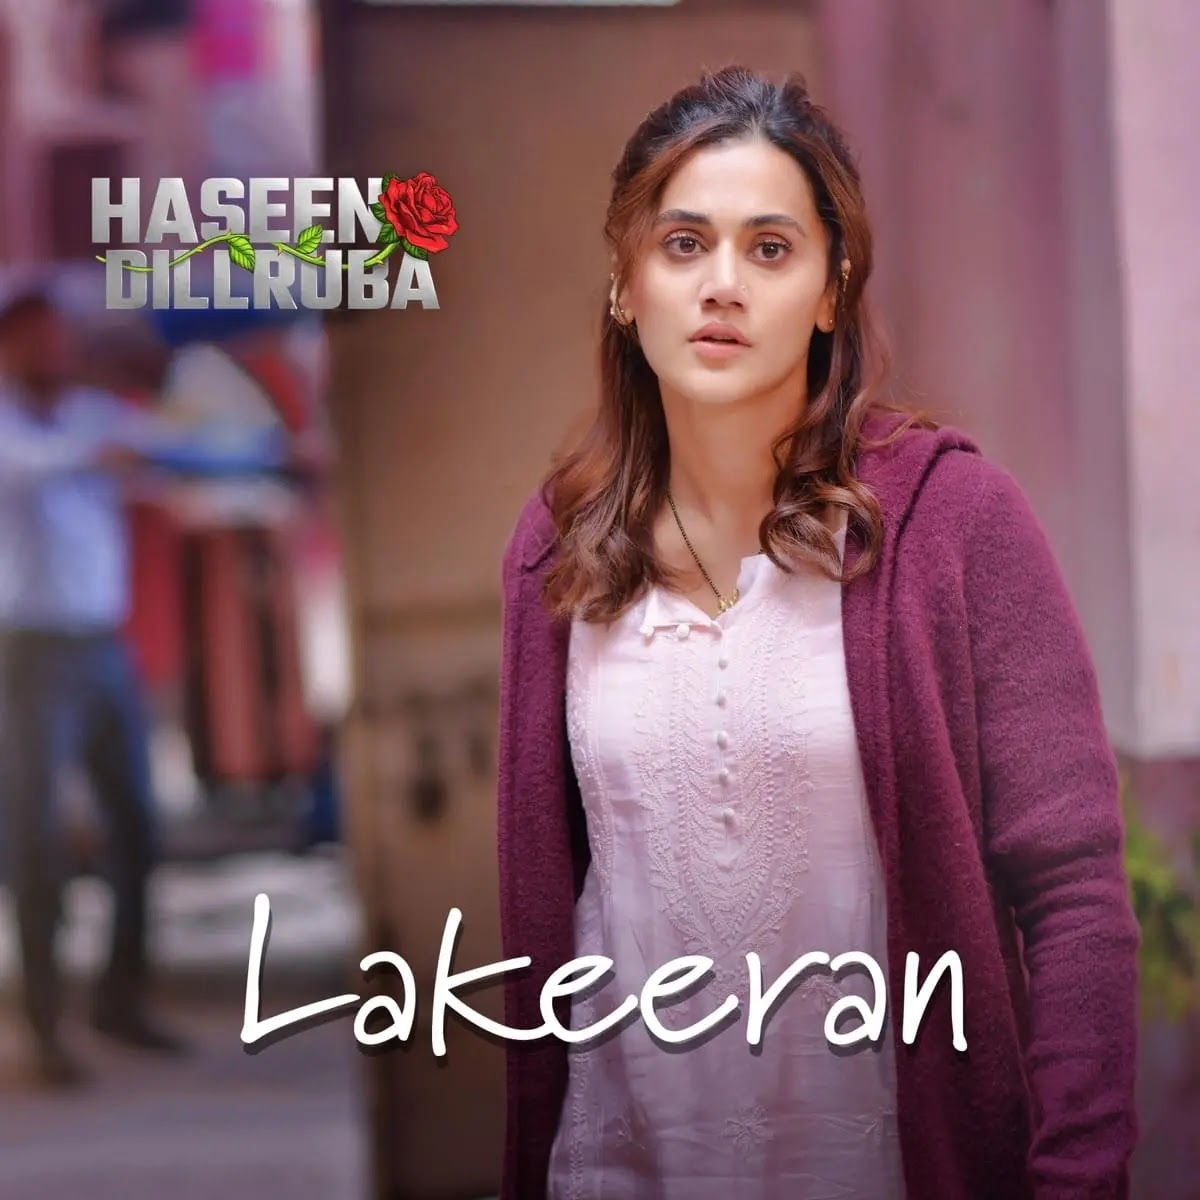 Lakeeran Haseen Dillruba Mp3 Song Download 320kbps Free